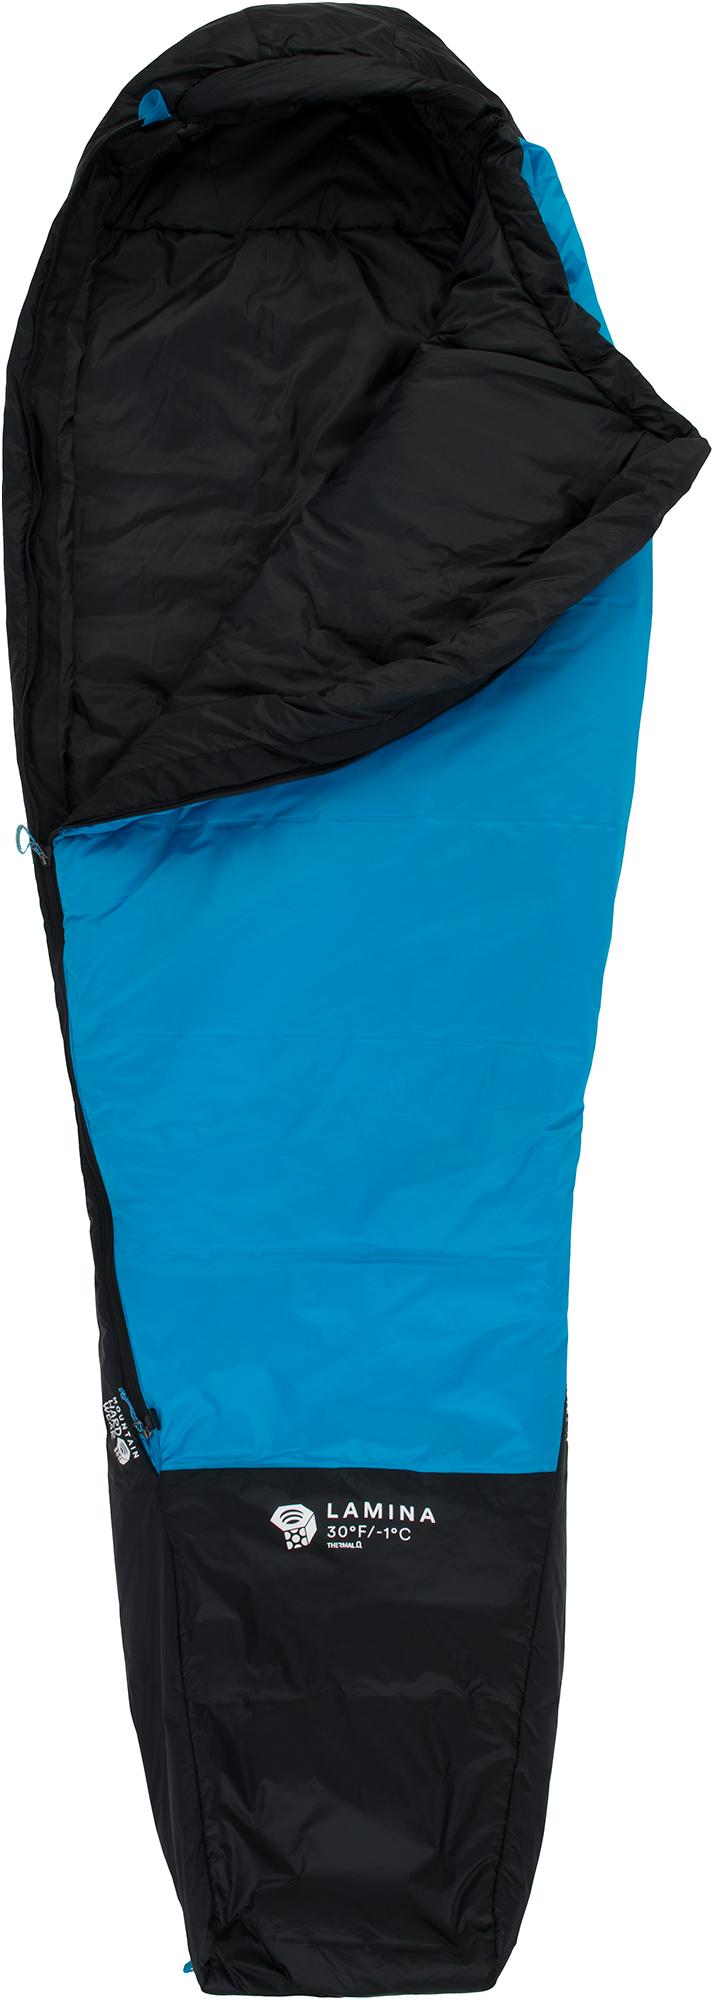 Mountain Hardwear Mountain Hardwear Lamina™ 30F/-1C